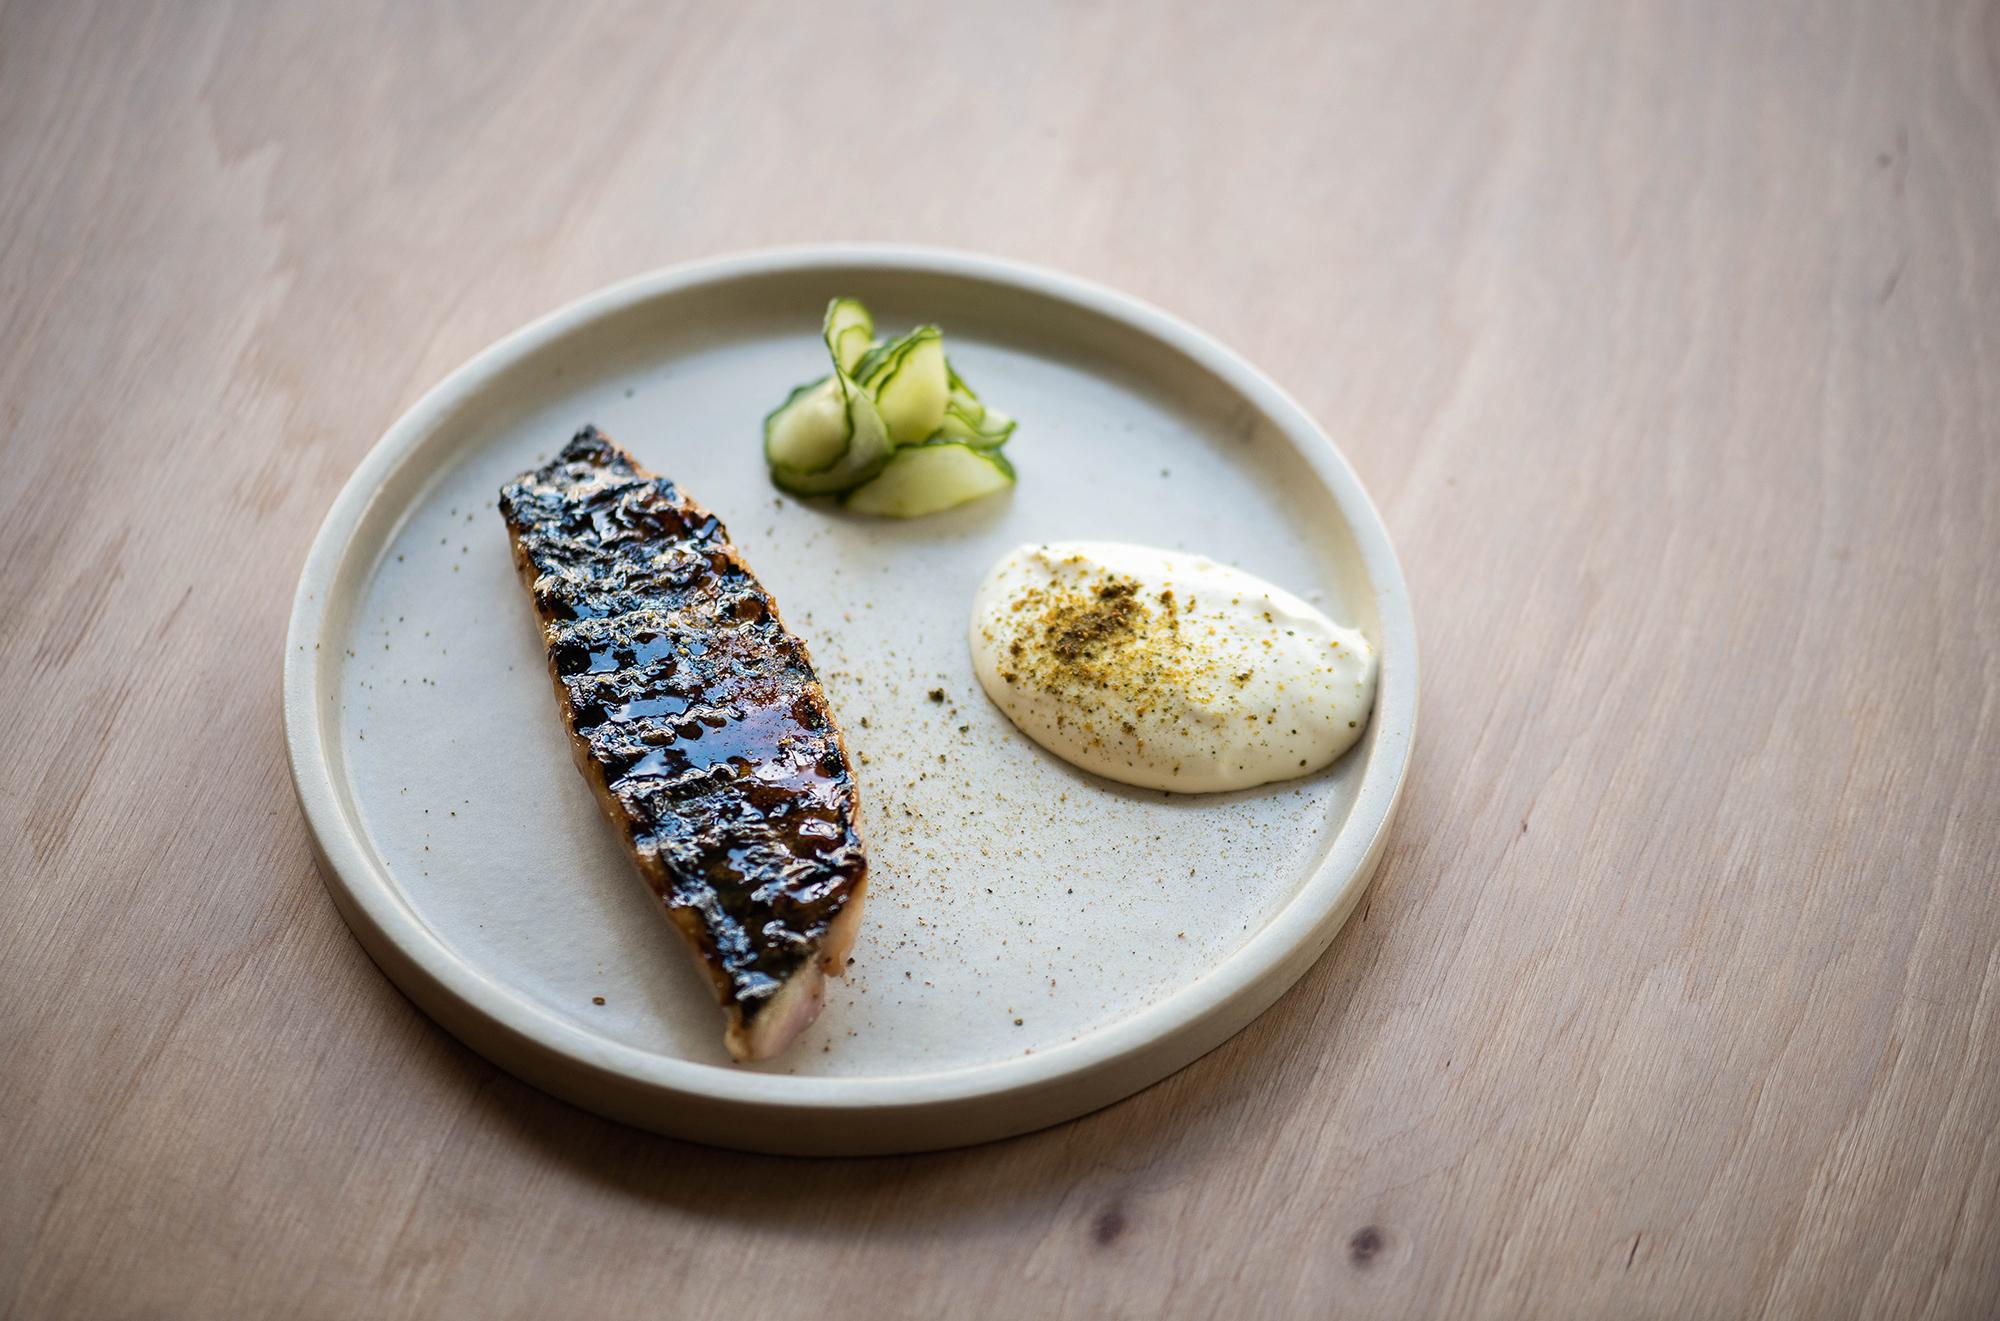 Charred mackerel fillet, pickled cucumber, gherkin powder, hung creme fraiche